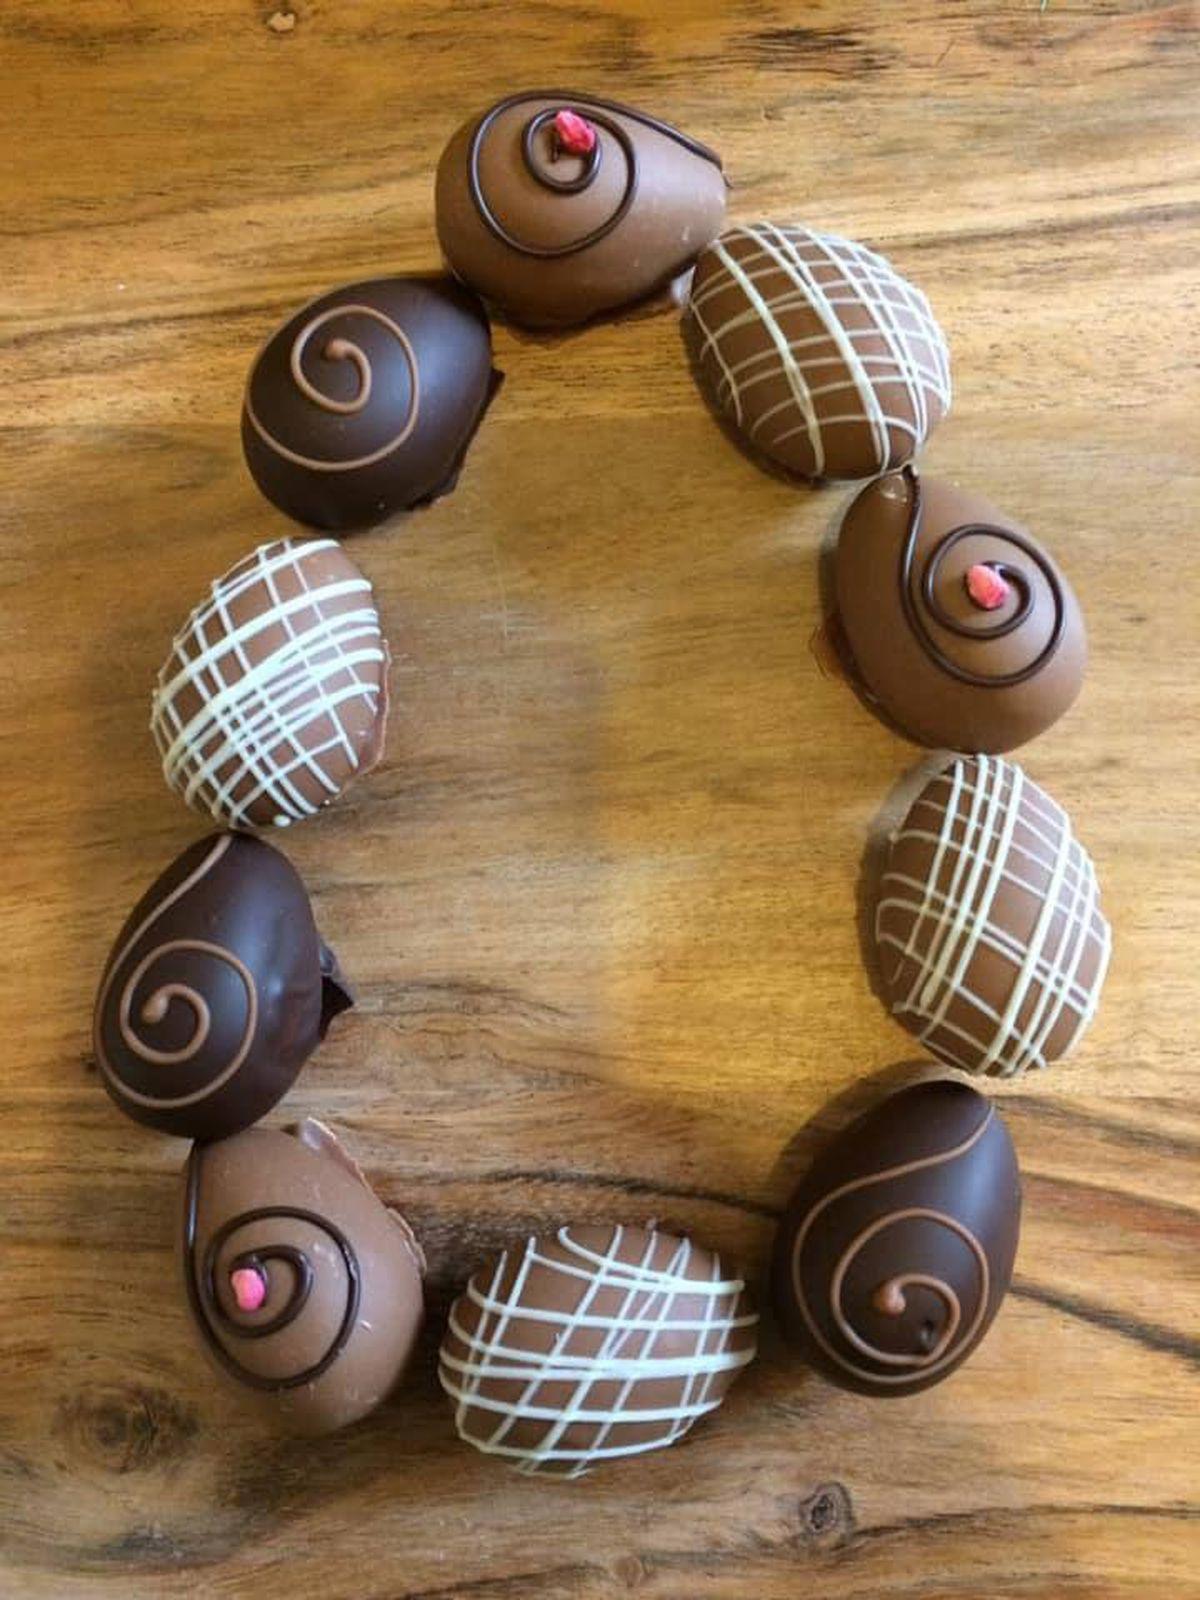 Richard's Easter egg-shaped chocolate truffles